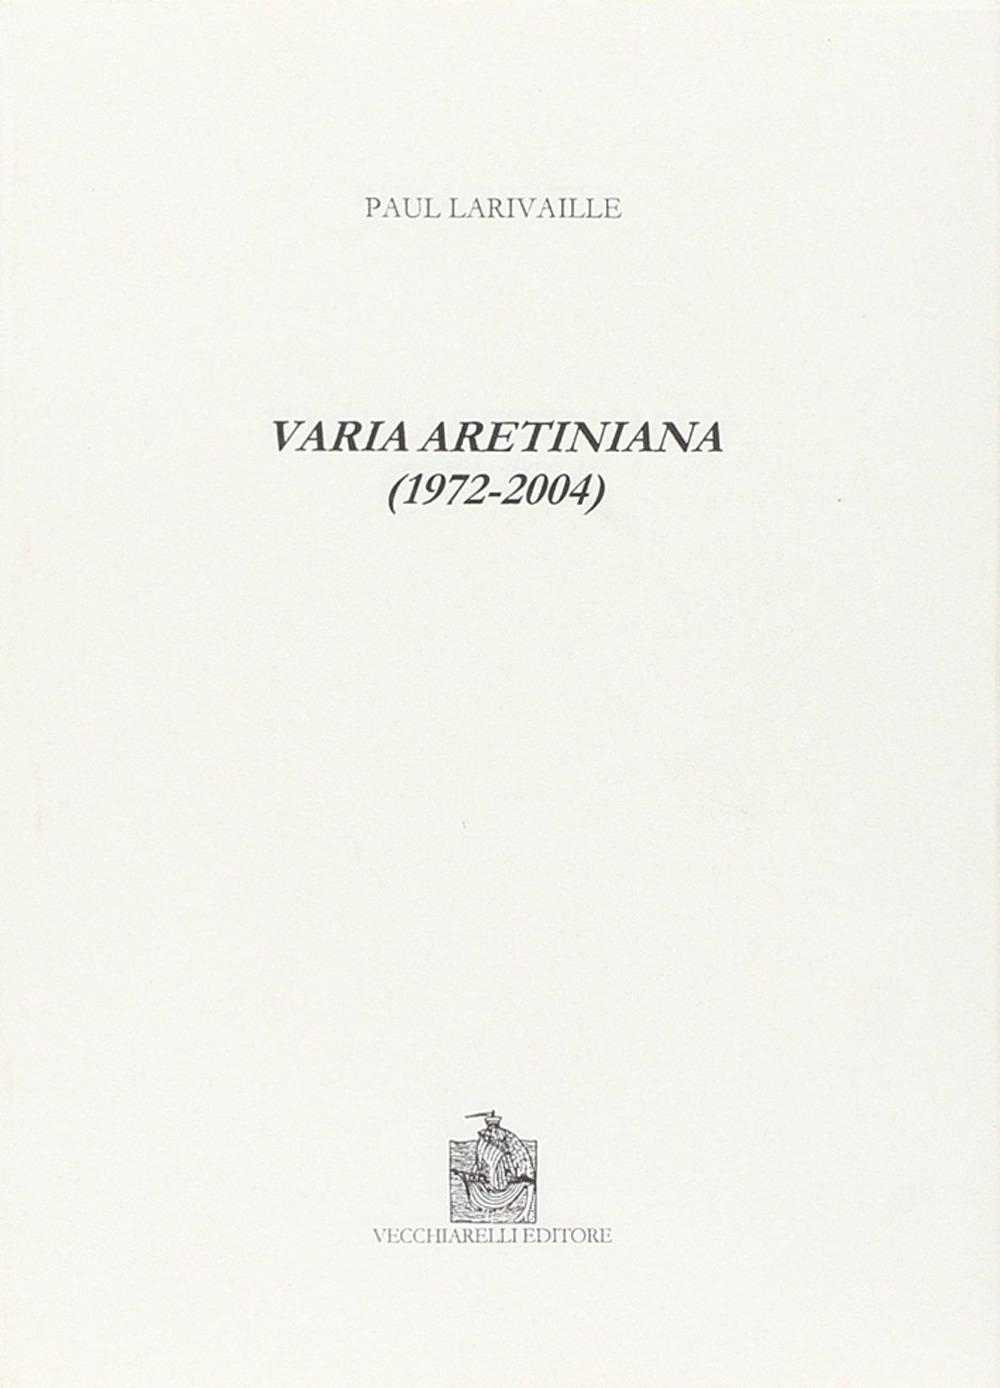 Varia aretiniana (1972-2004).